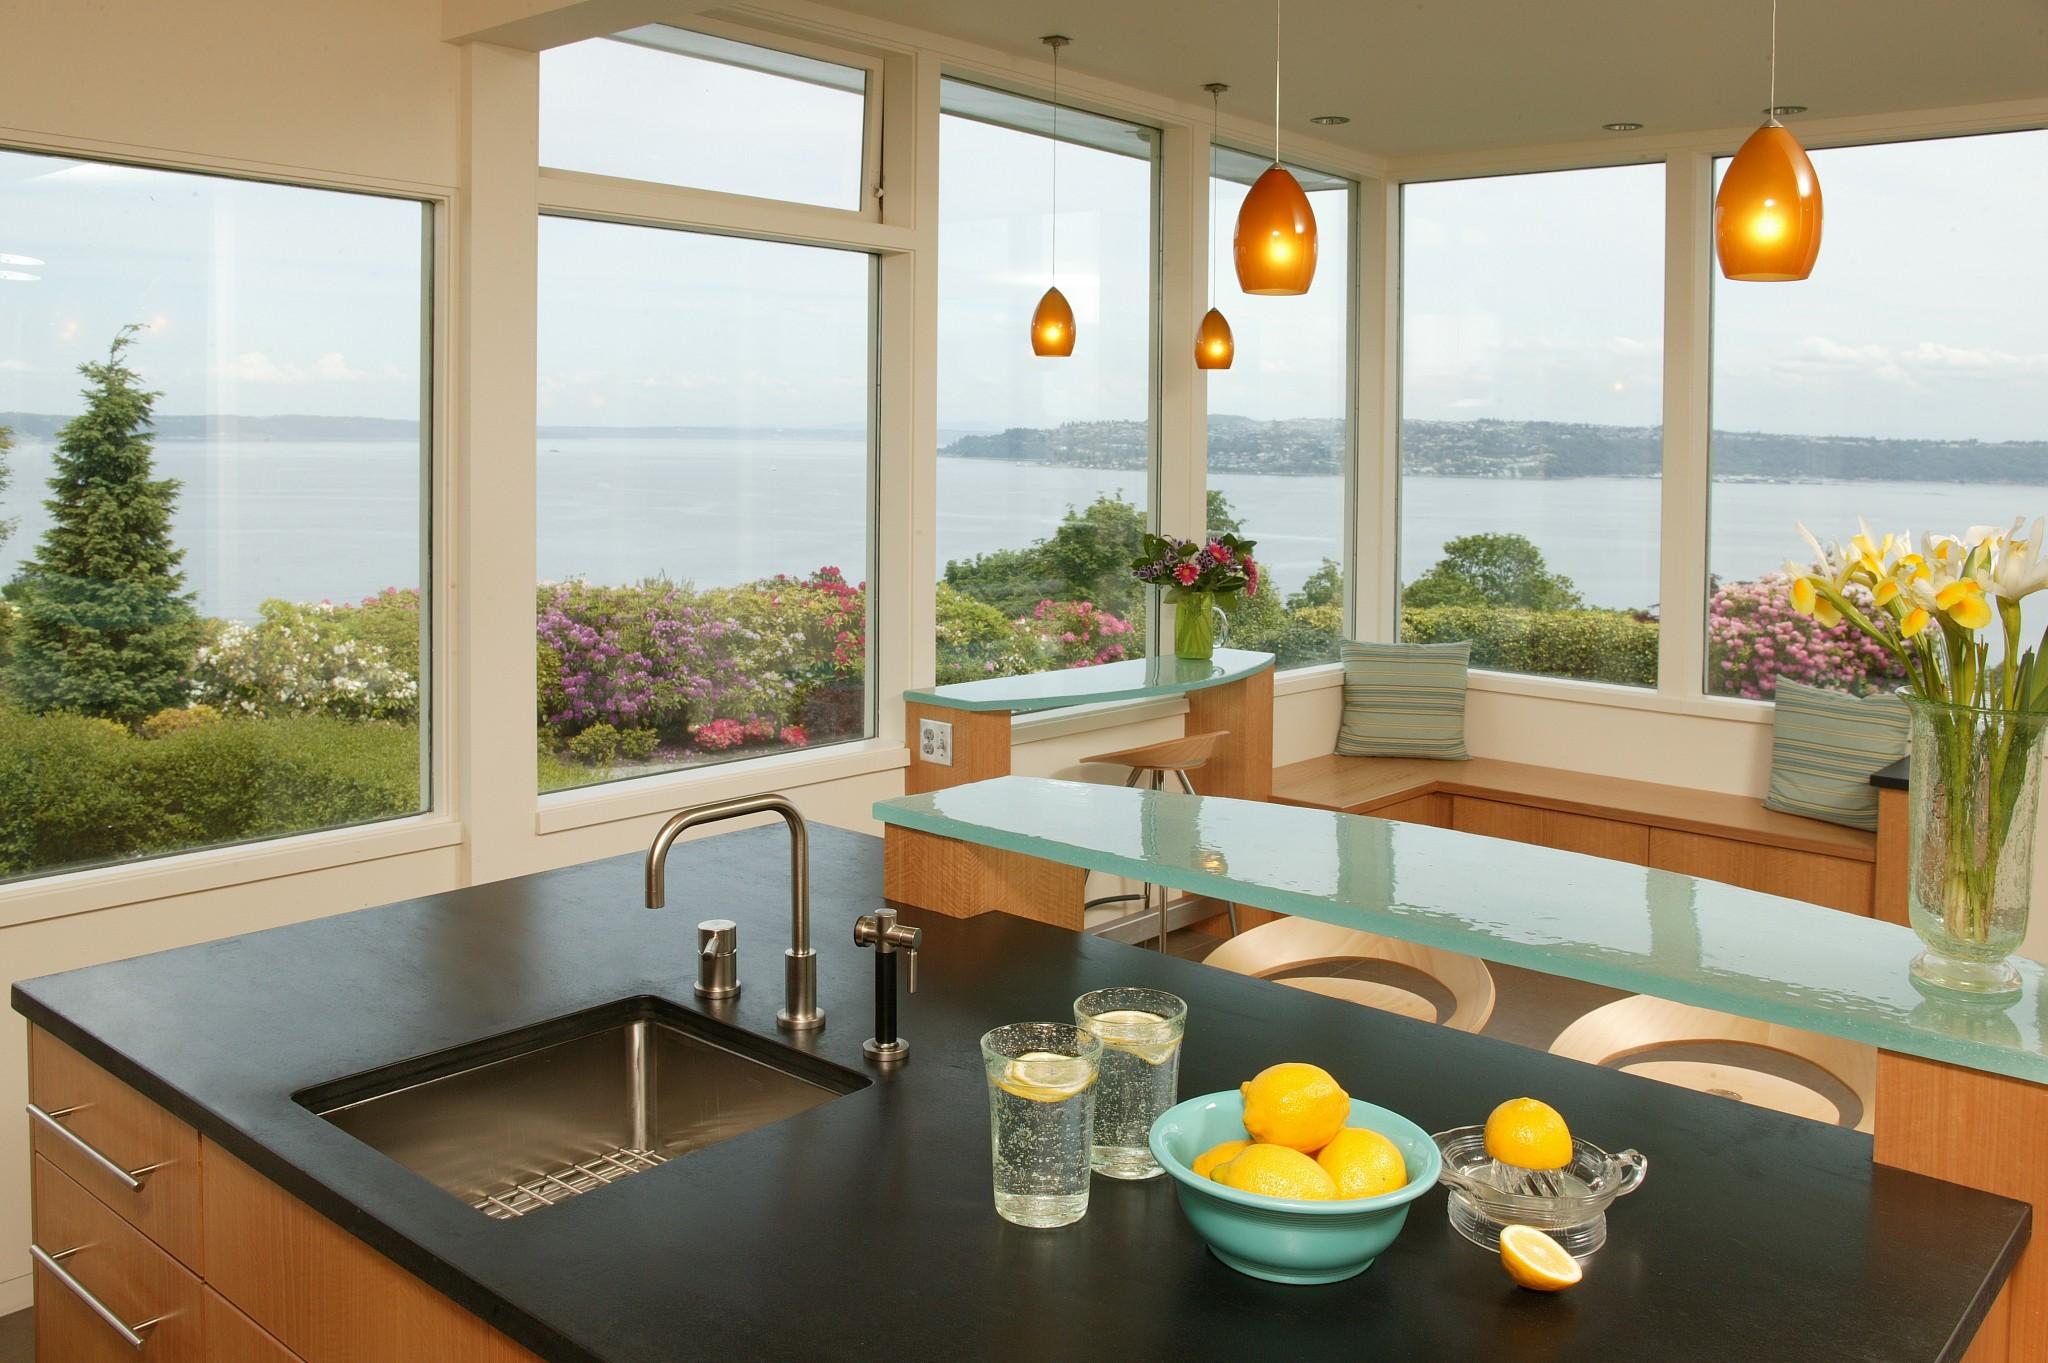 Kitchen Remodel | M.R. Construction | Tacoma, WA